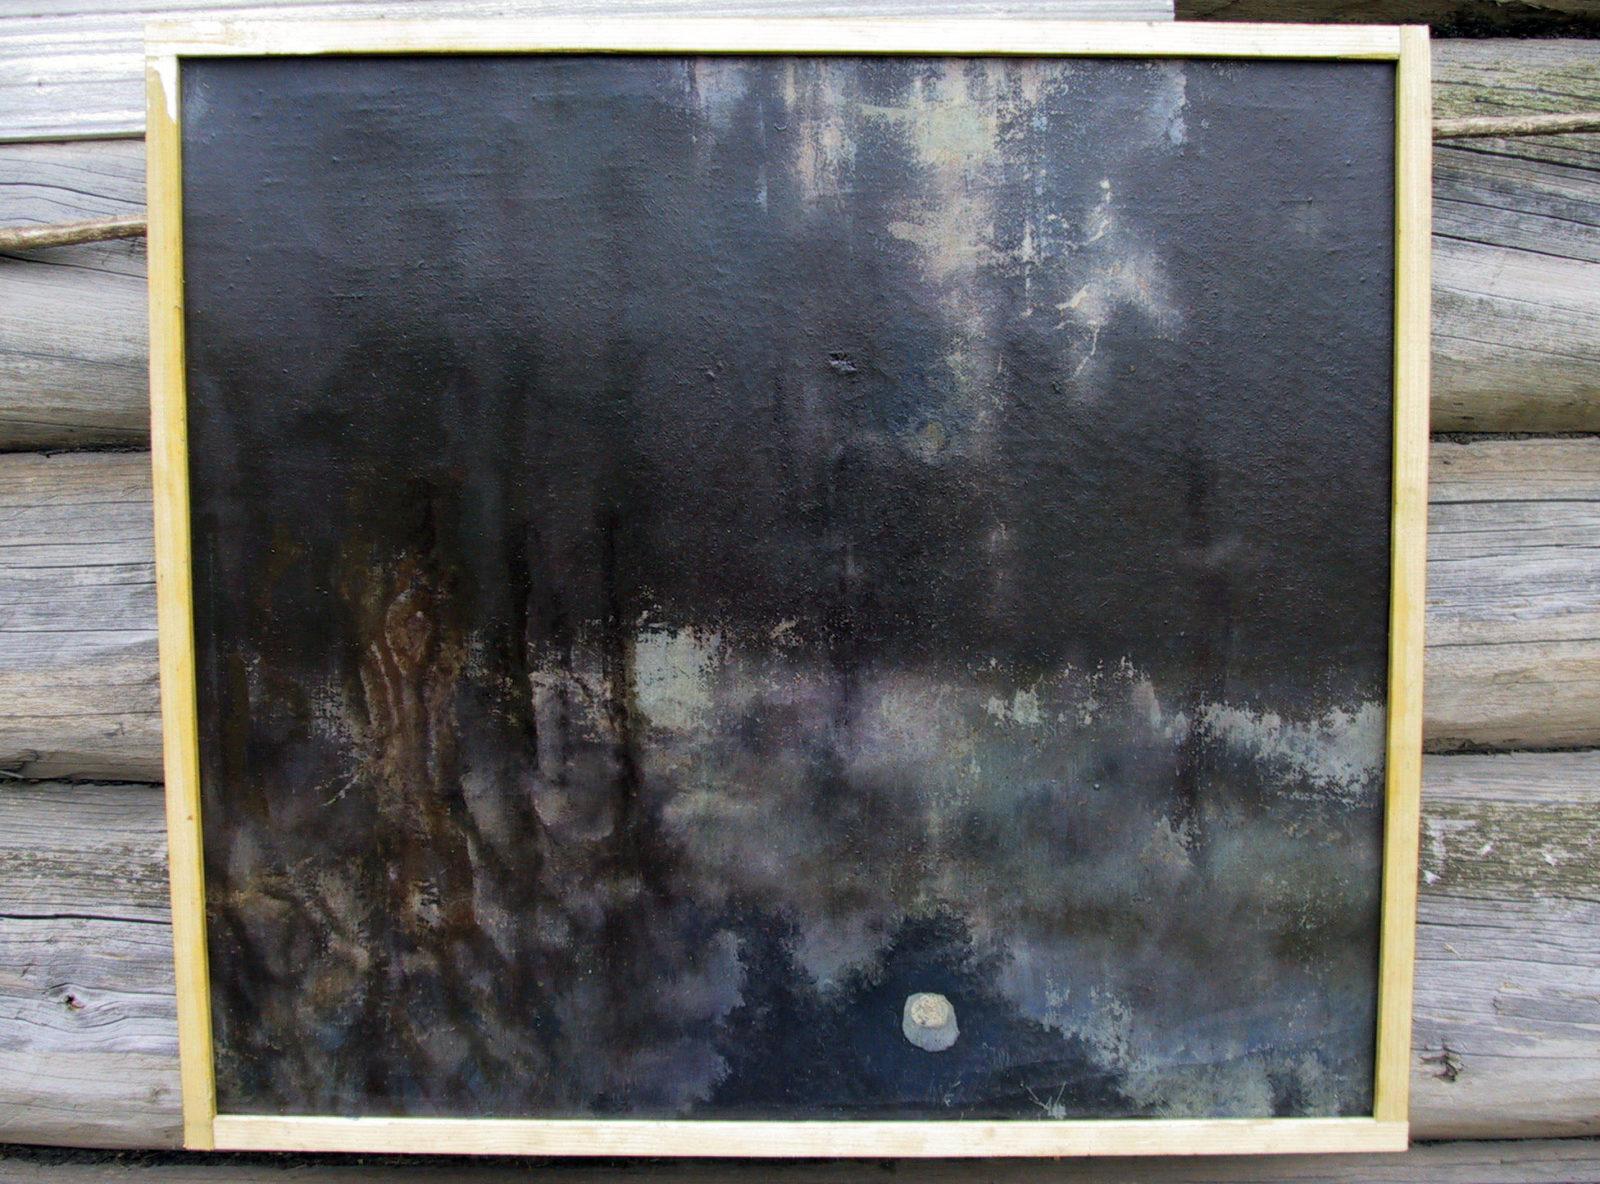 Дориан Артемьевич Голдобин - художник - живопись - река Луга